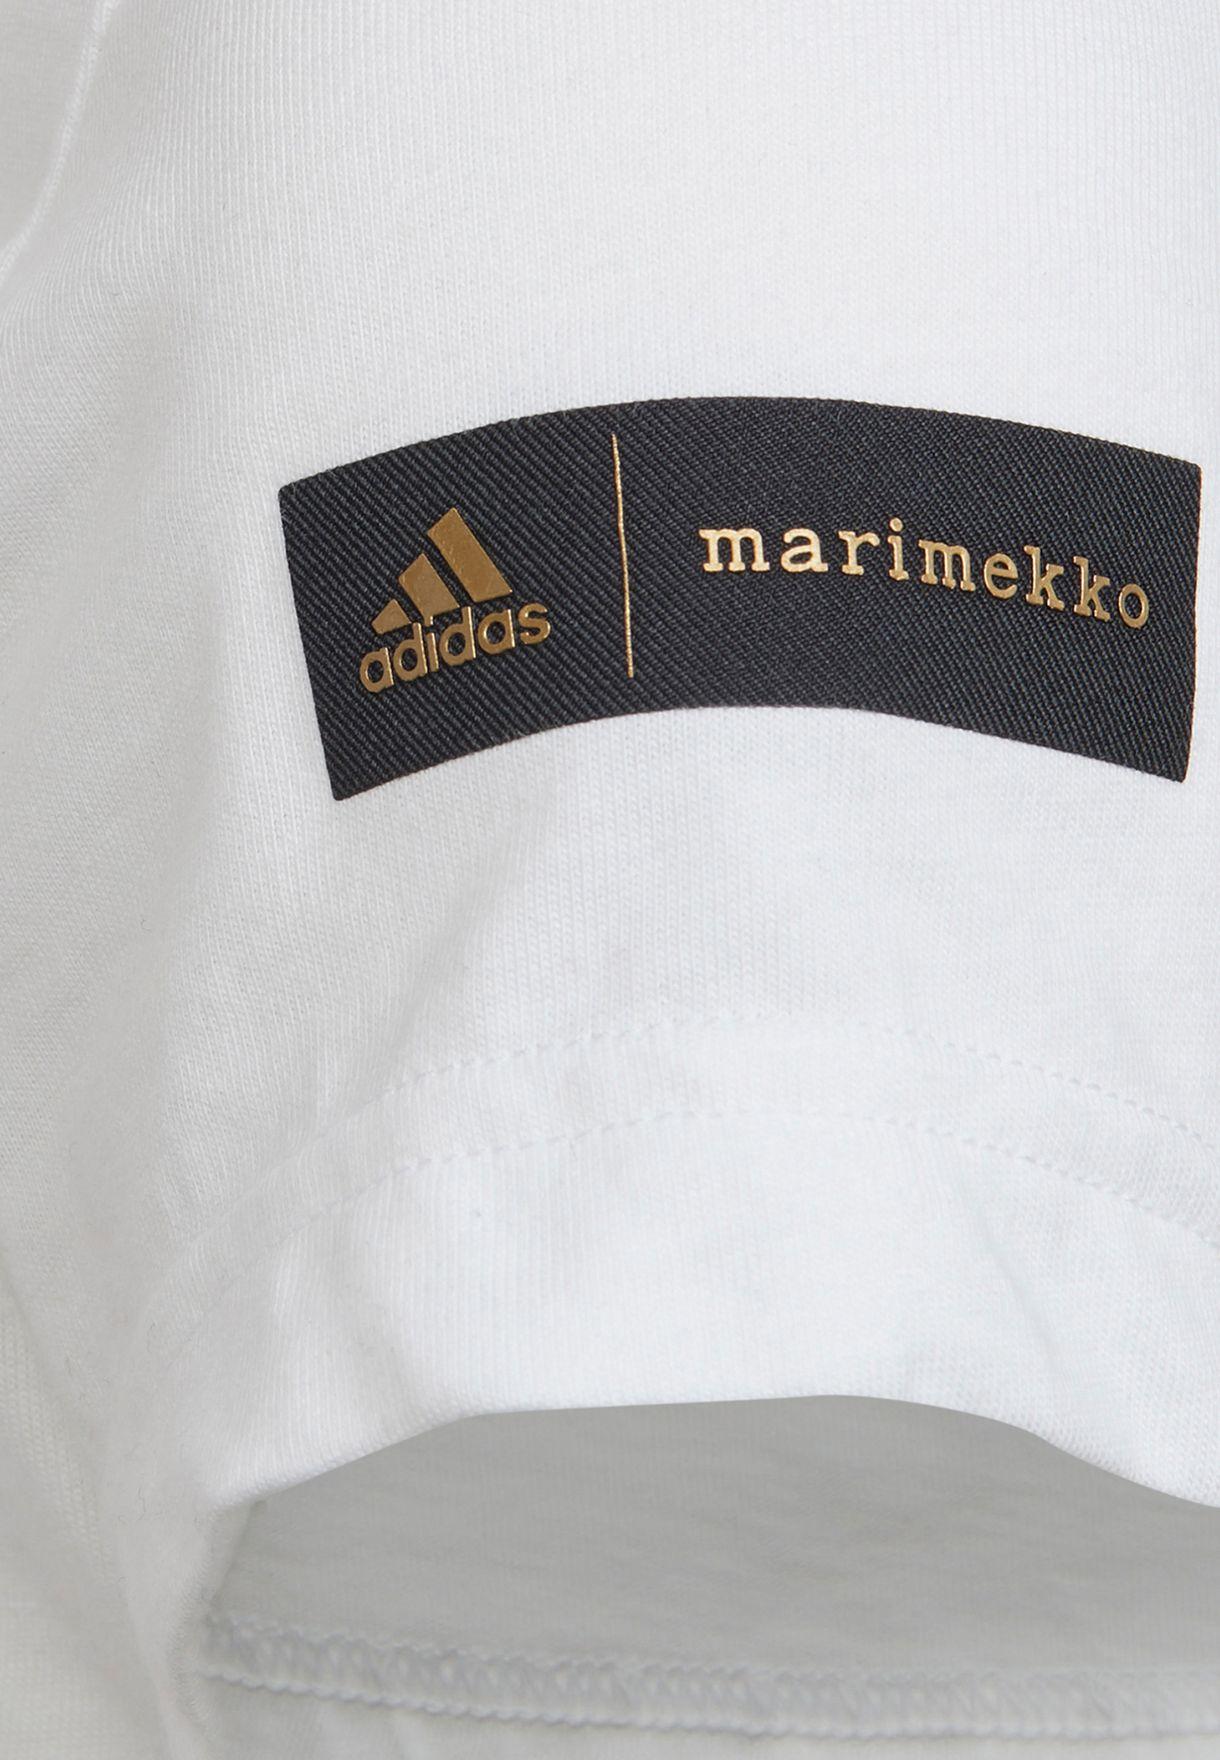 Youth Marimekko T-Shirt